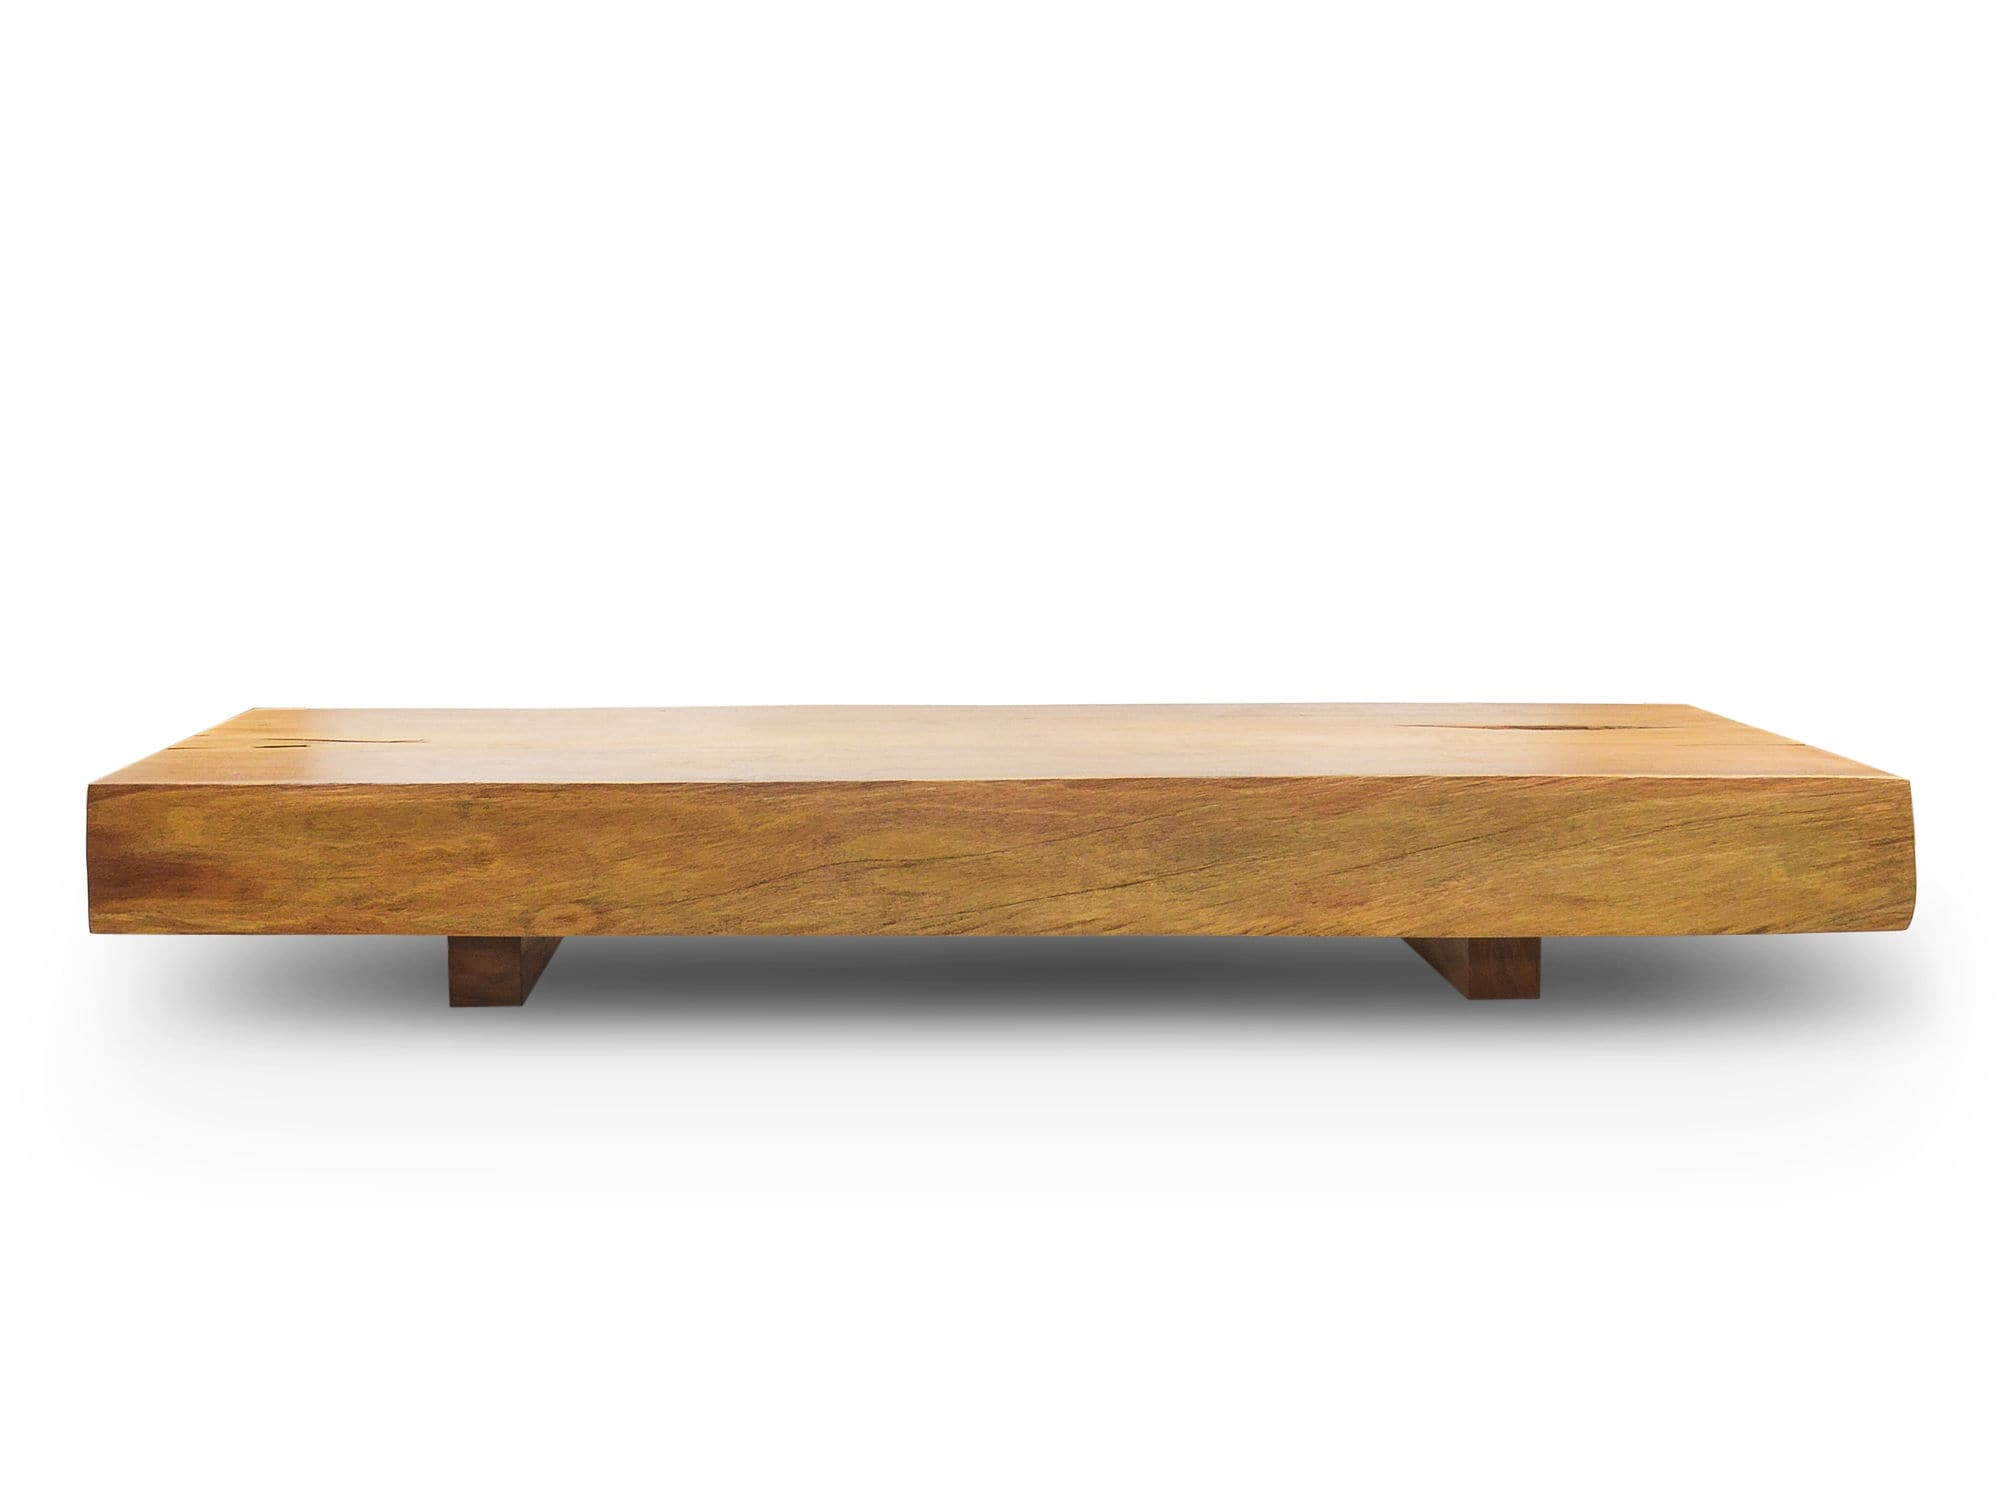 Moderner Couchtisch Massivholz Rechteckig Innenraum Organic